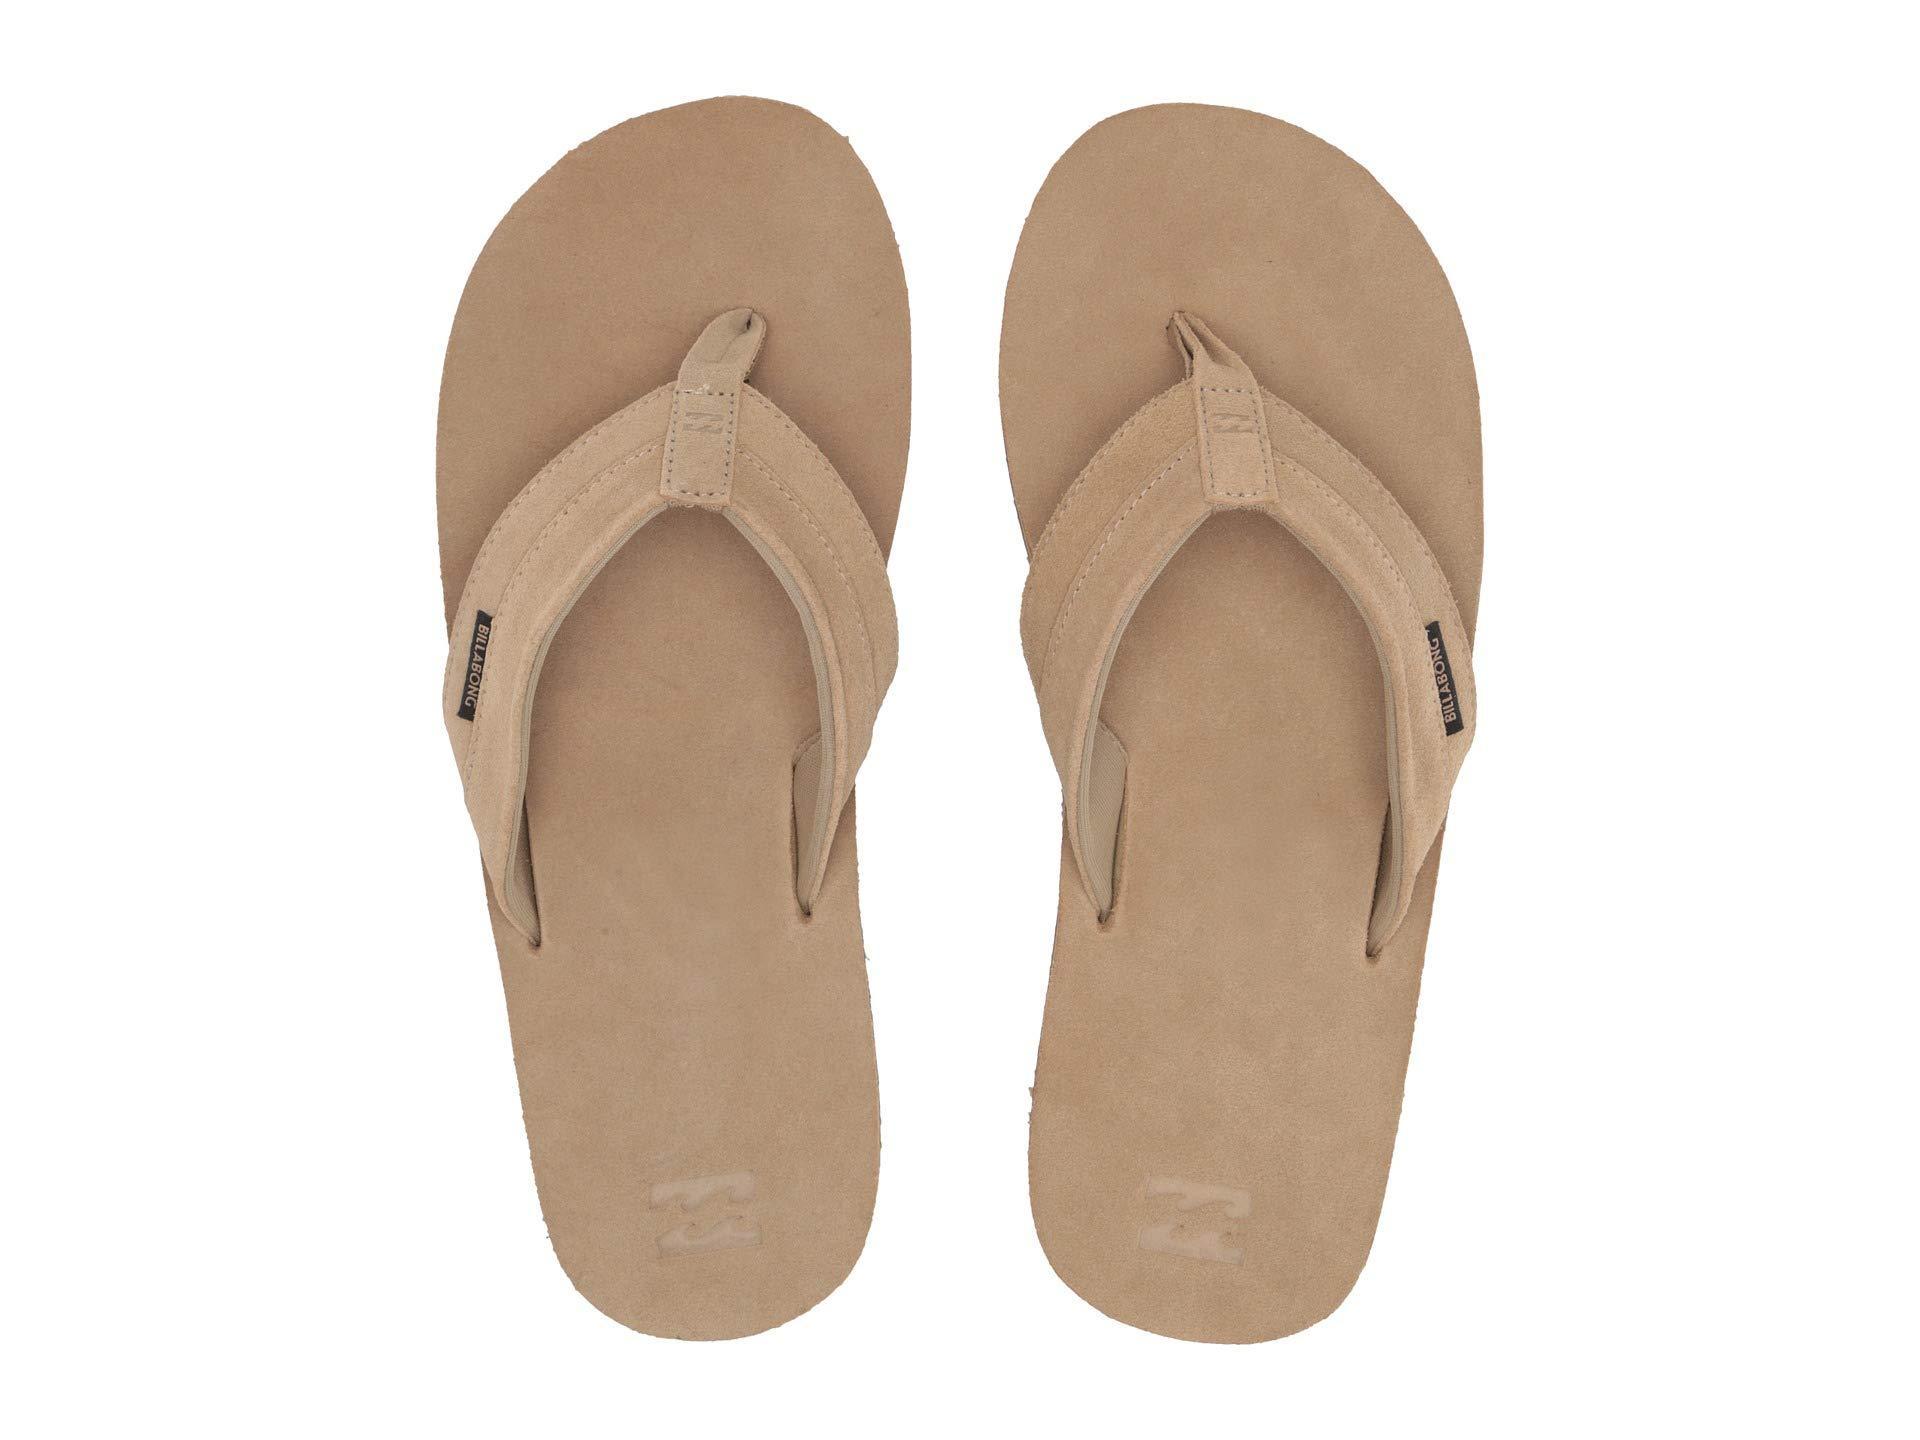 b66566575 Billabong - All Day Leather (dark Brown) Men s Sandals for Men - Lyst. View  fullscreen